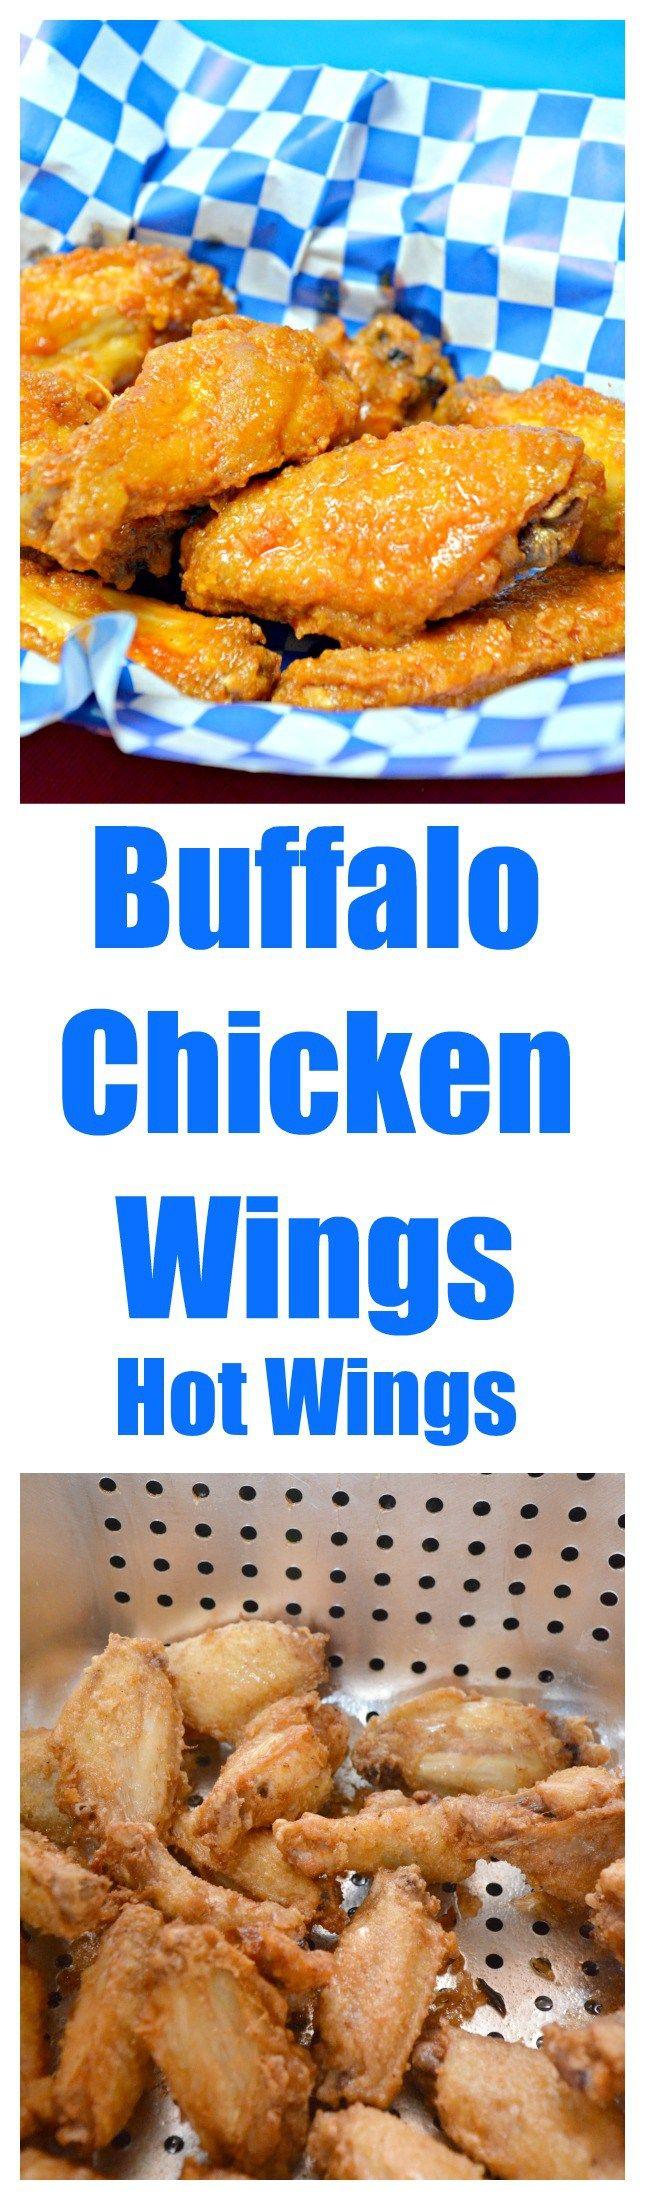 Crispy Fried Buffalo Chicken Wings with Garlic Hot Sauce #wings #hot wings #buffalo wings #Superbowl #appetizer #chicken #football food